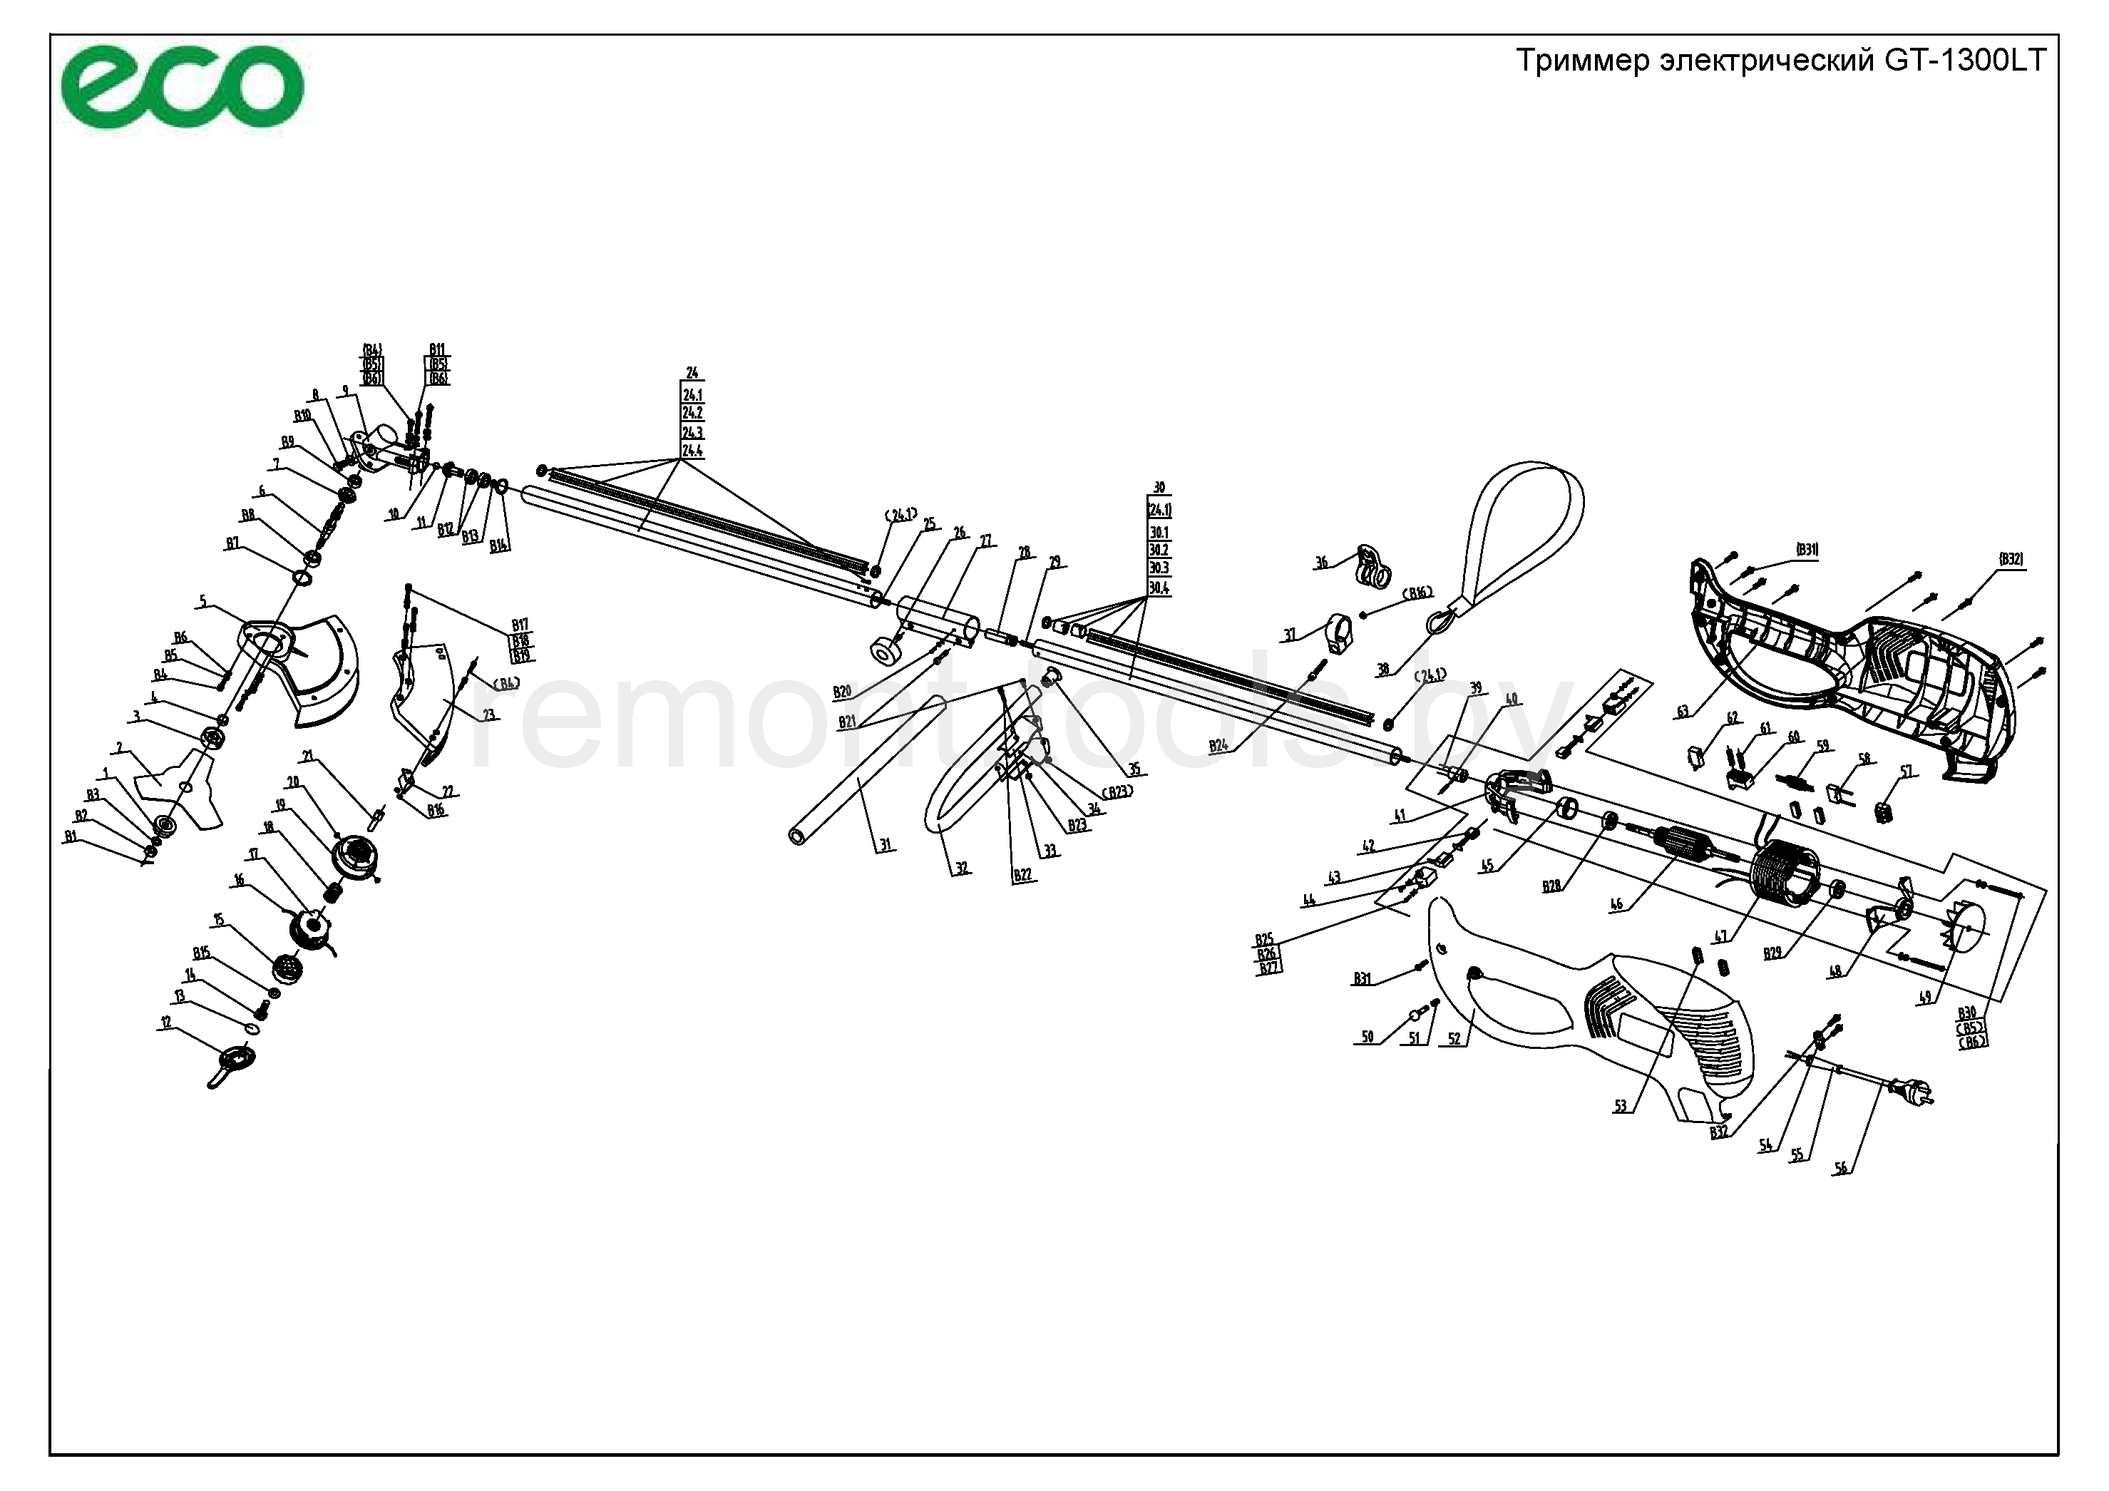 Eco Триммер электрический Gt 1300lt